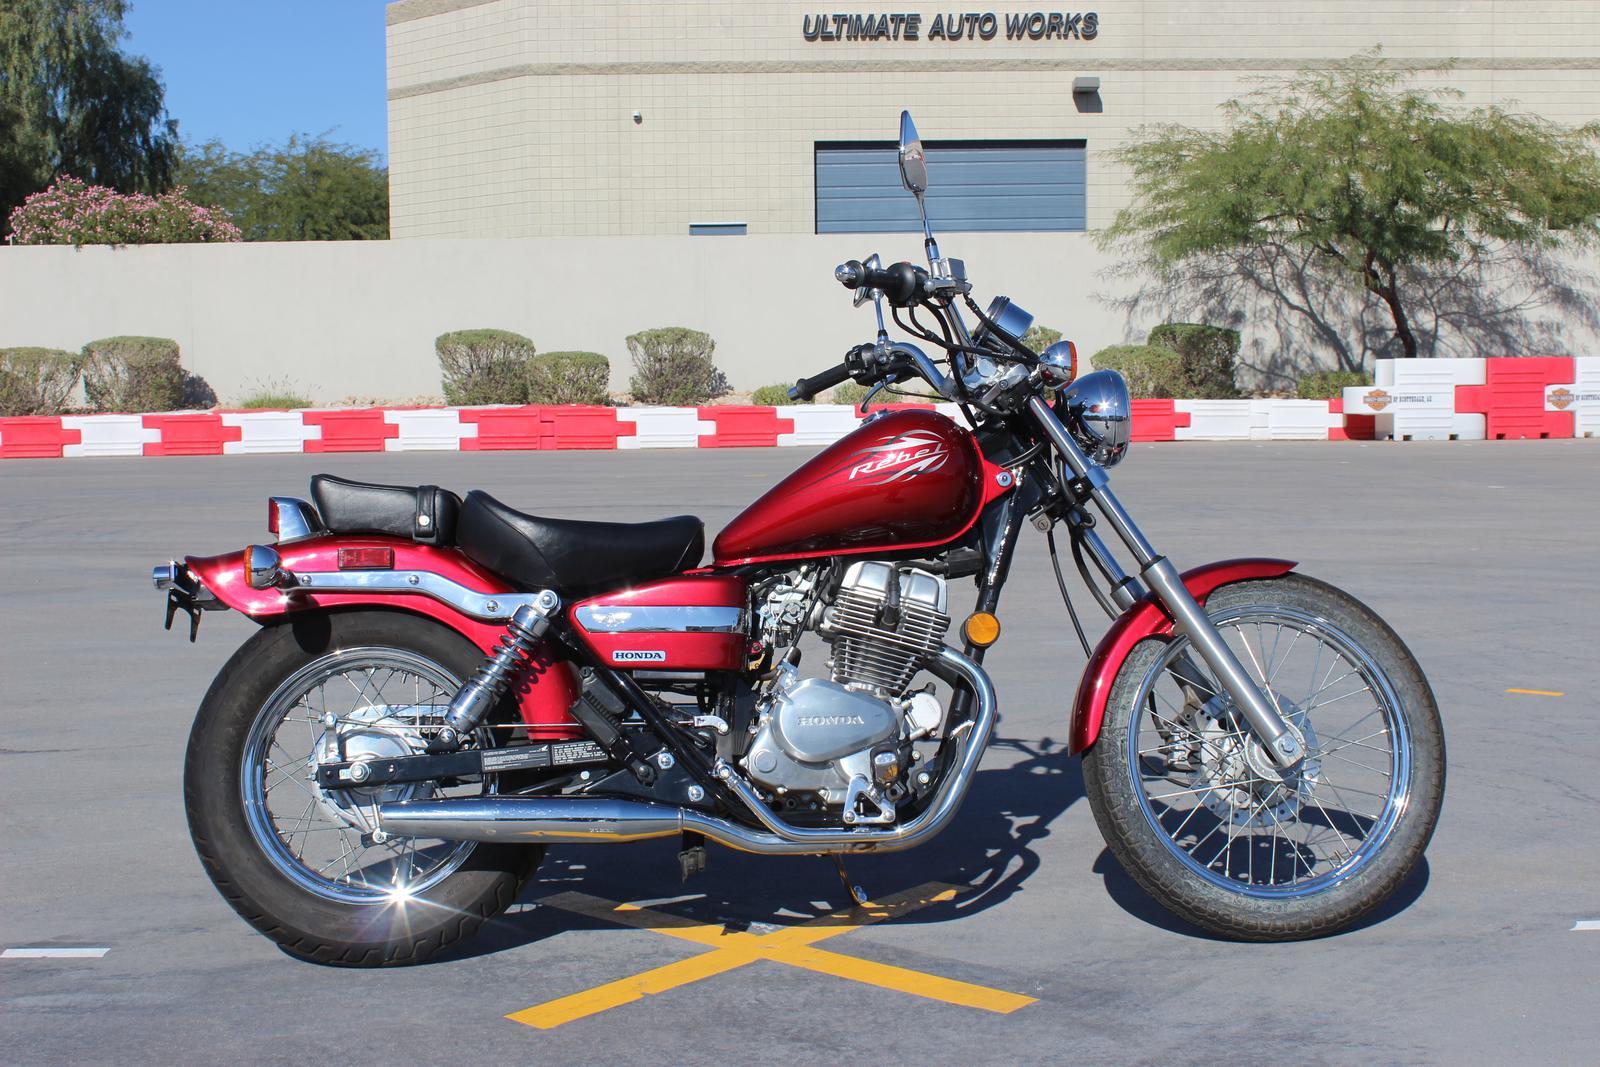 2012 honda rebel for sale in scottsdale, az | go az motorcycles